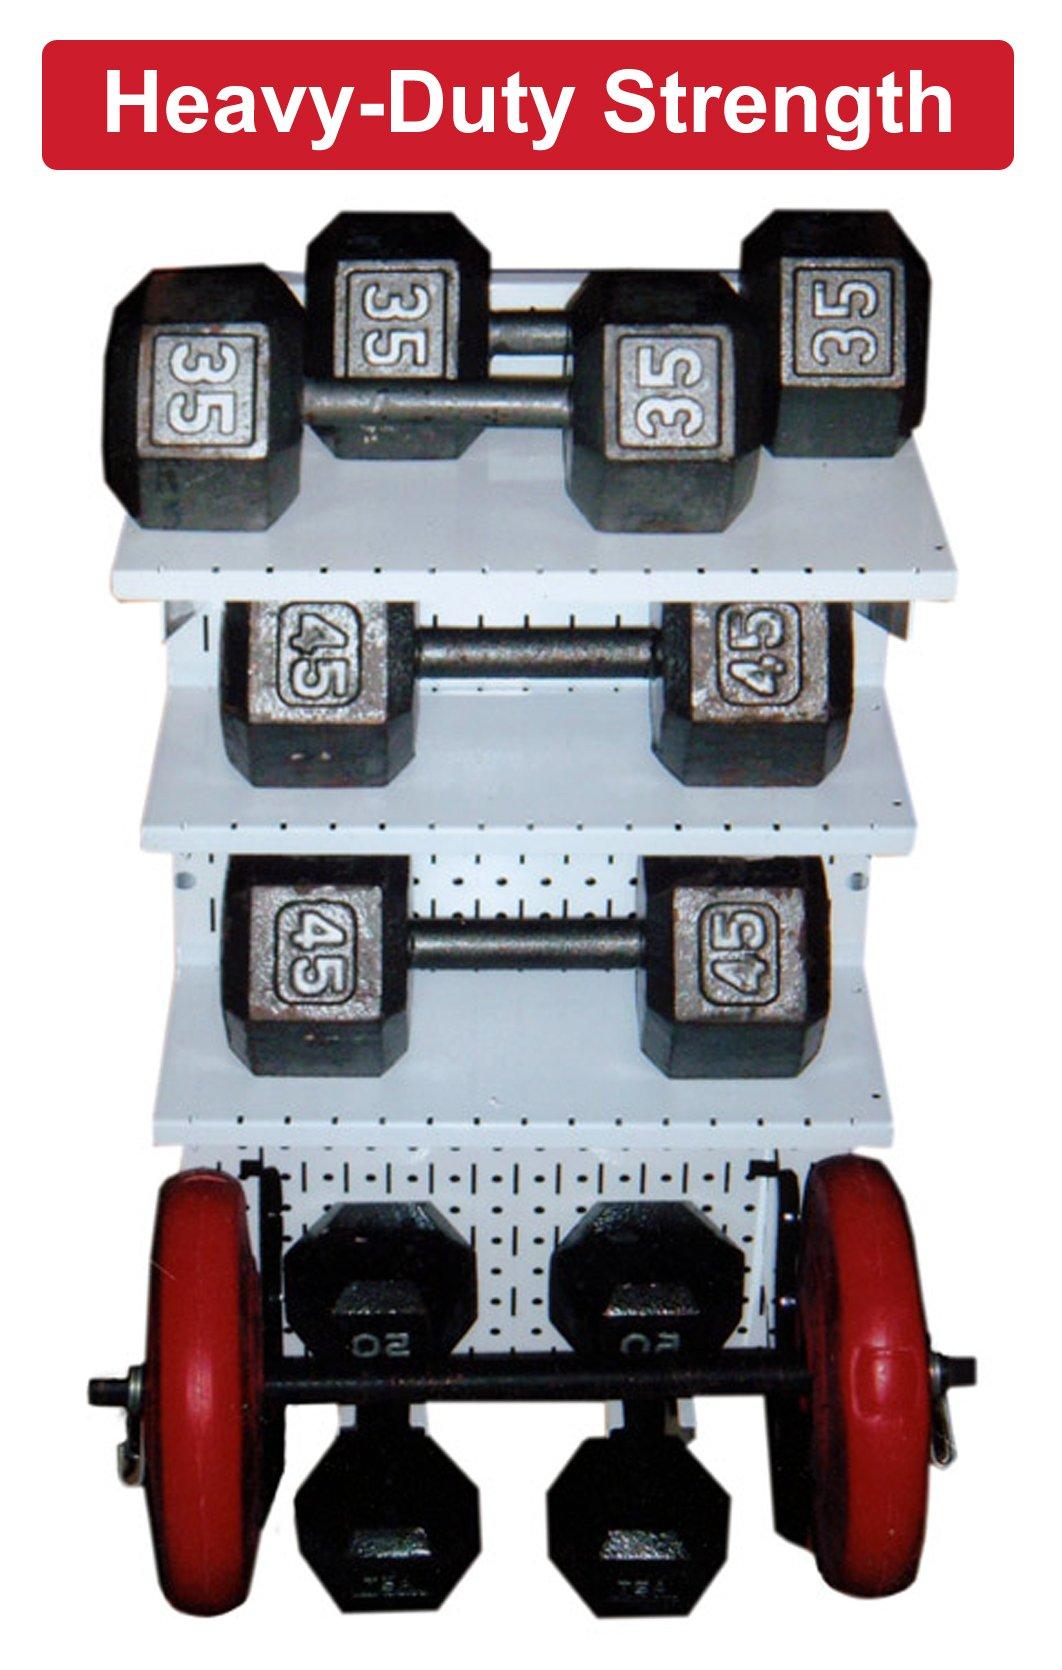 Wall Control 30-WRK-800WB Master Workbench Metal Pegboard Tool Organizer by Wall Control (Image #8)